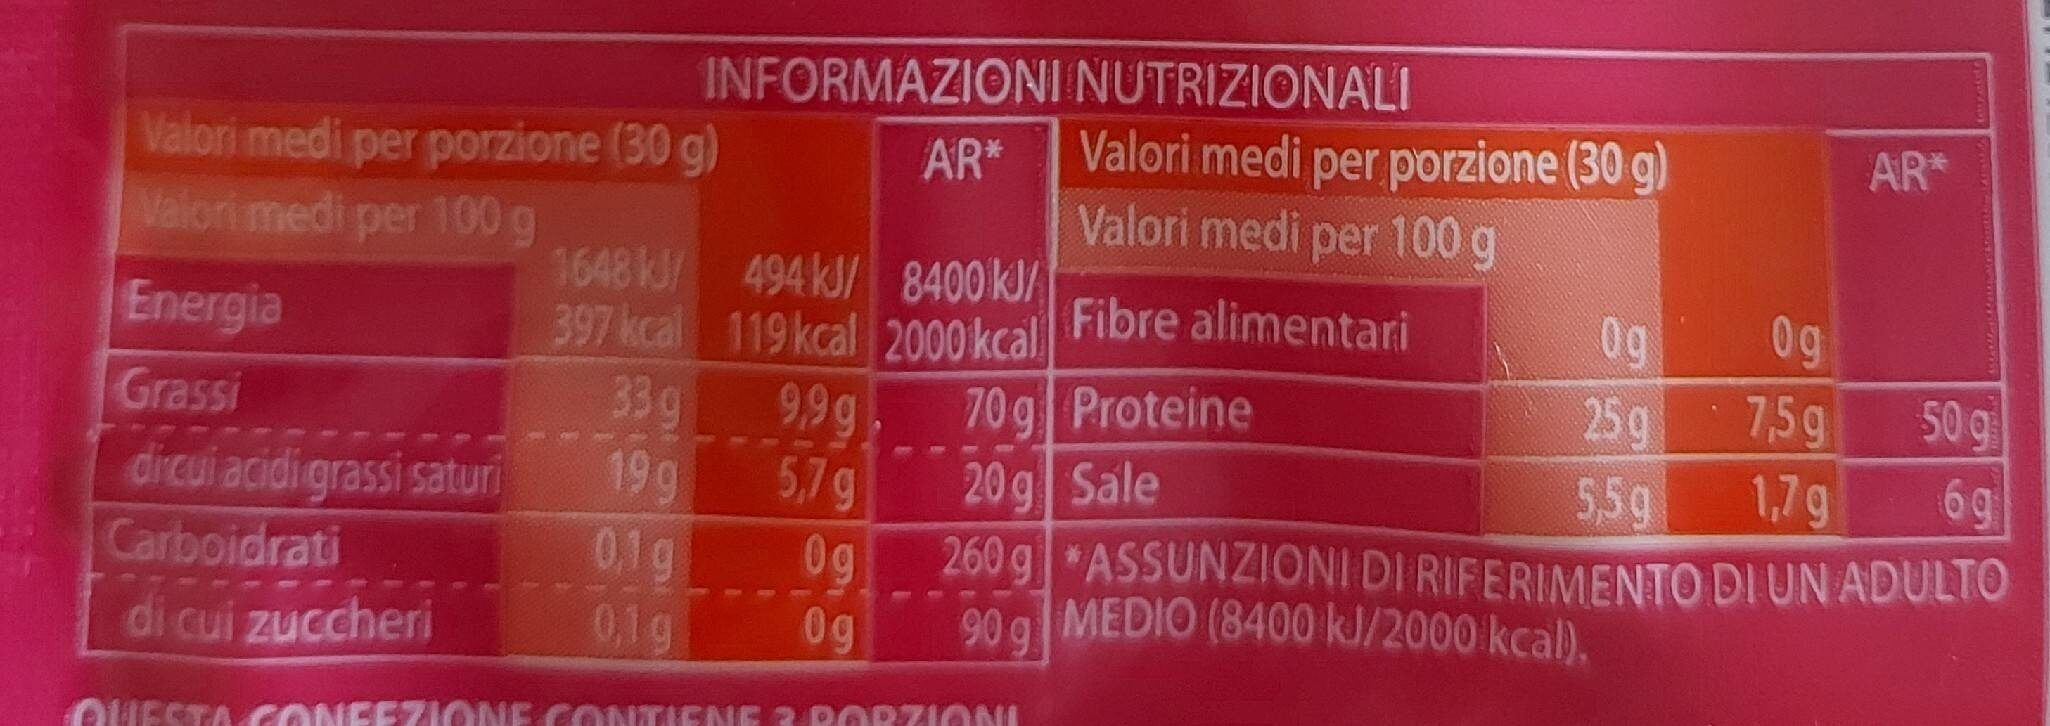 Pecorino Romano DOP Grattugiato - Nutrition facts - fr